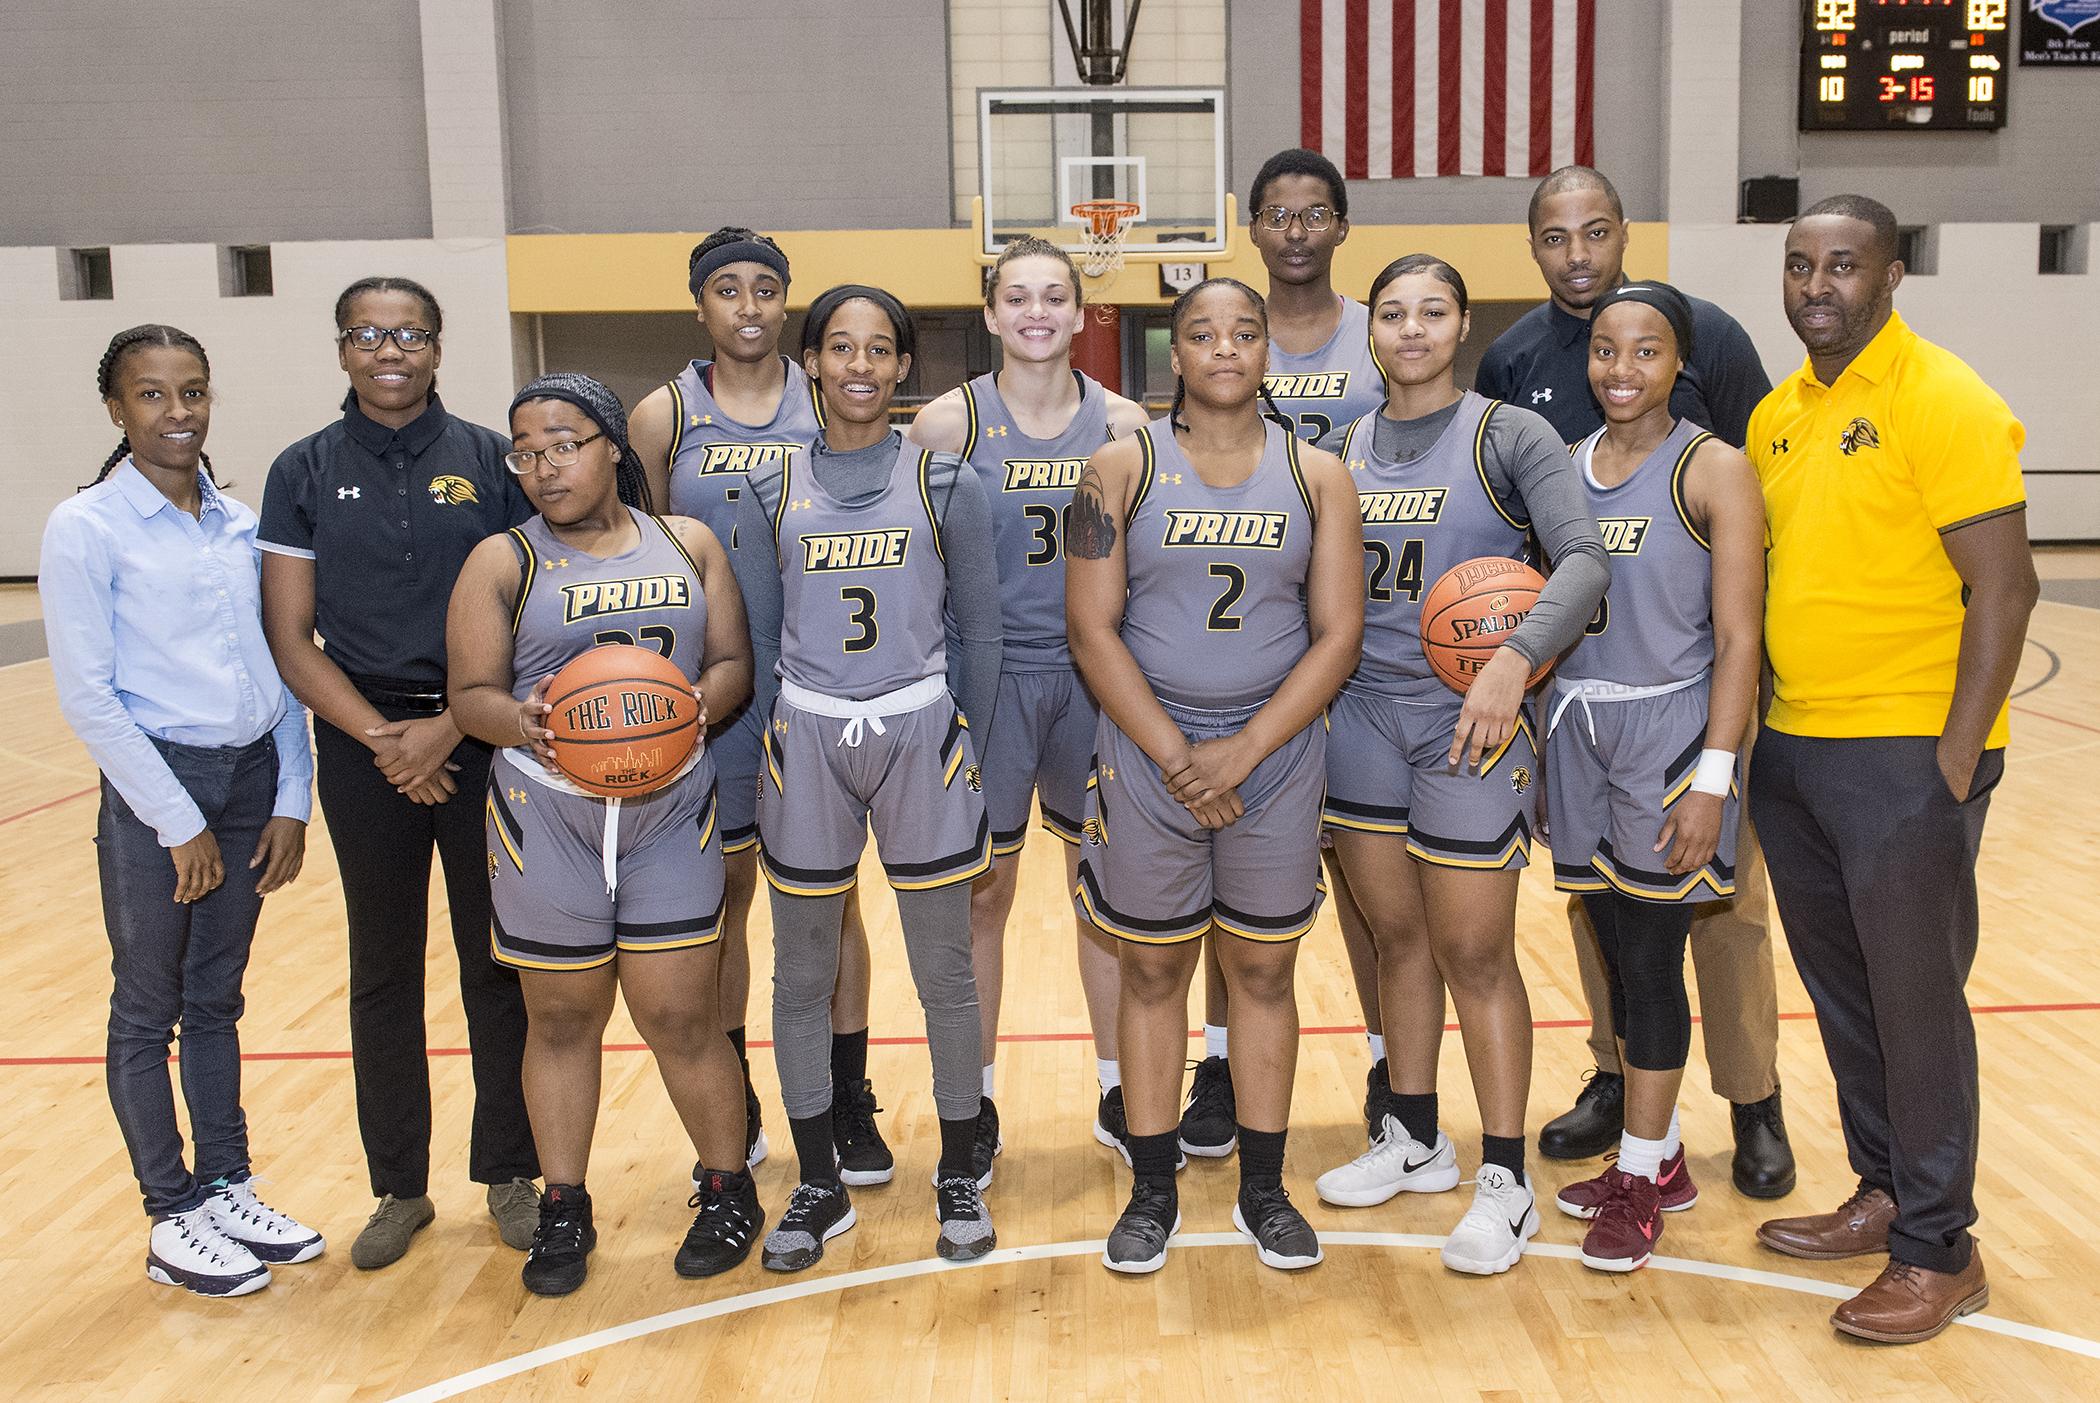 Community College of Philadelphia's women's basketball team